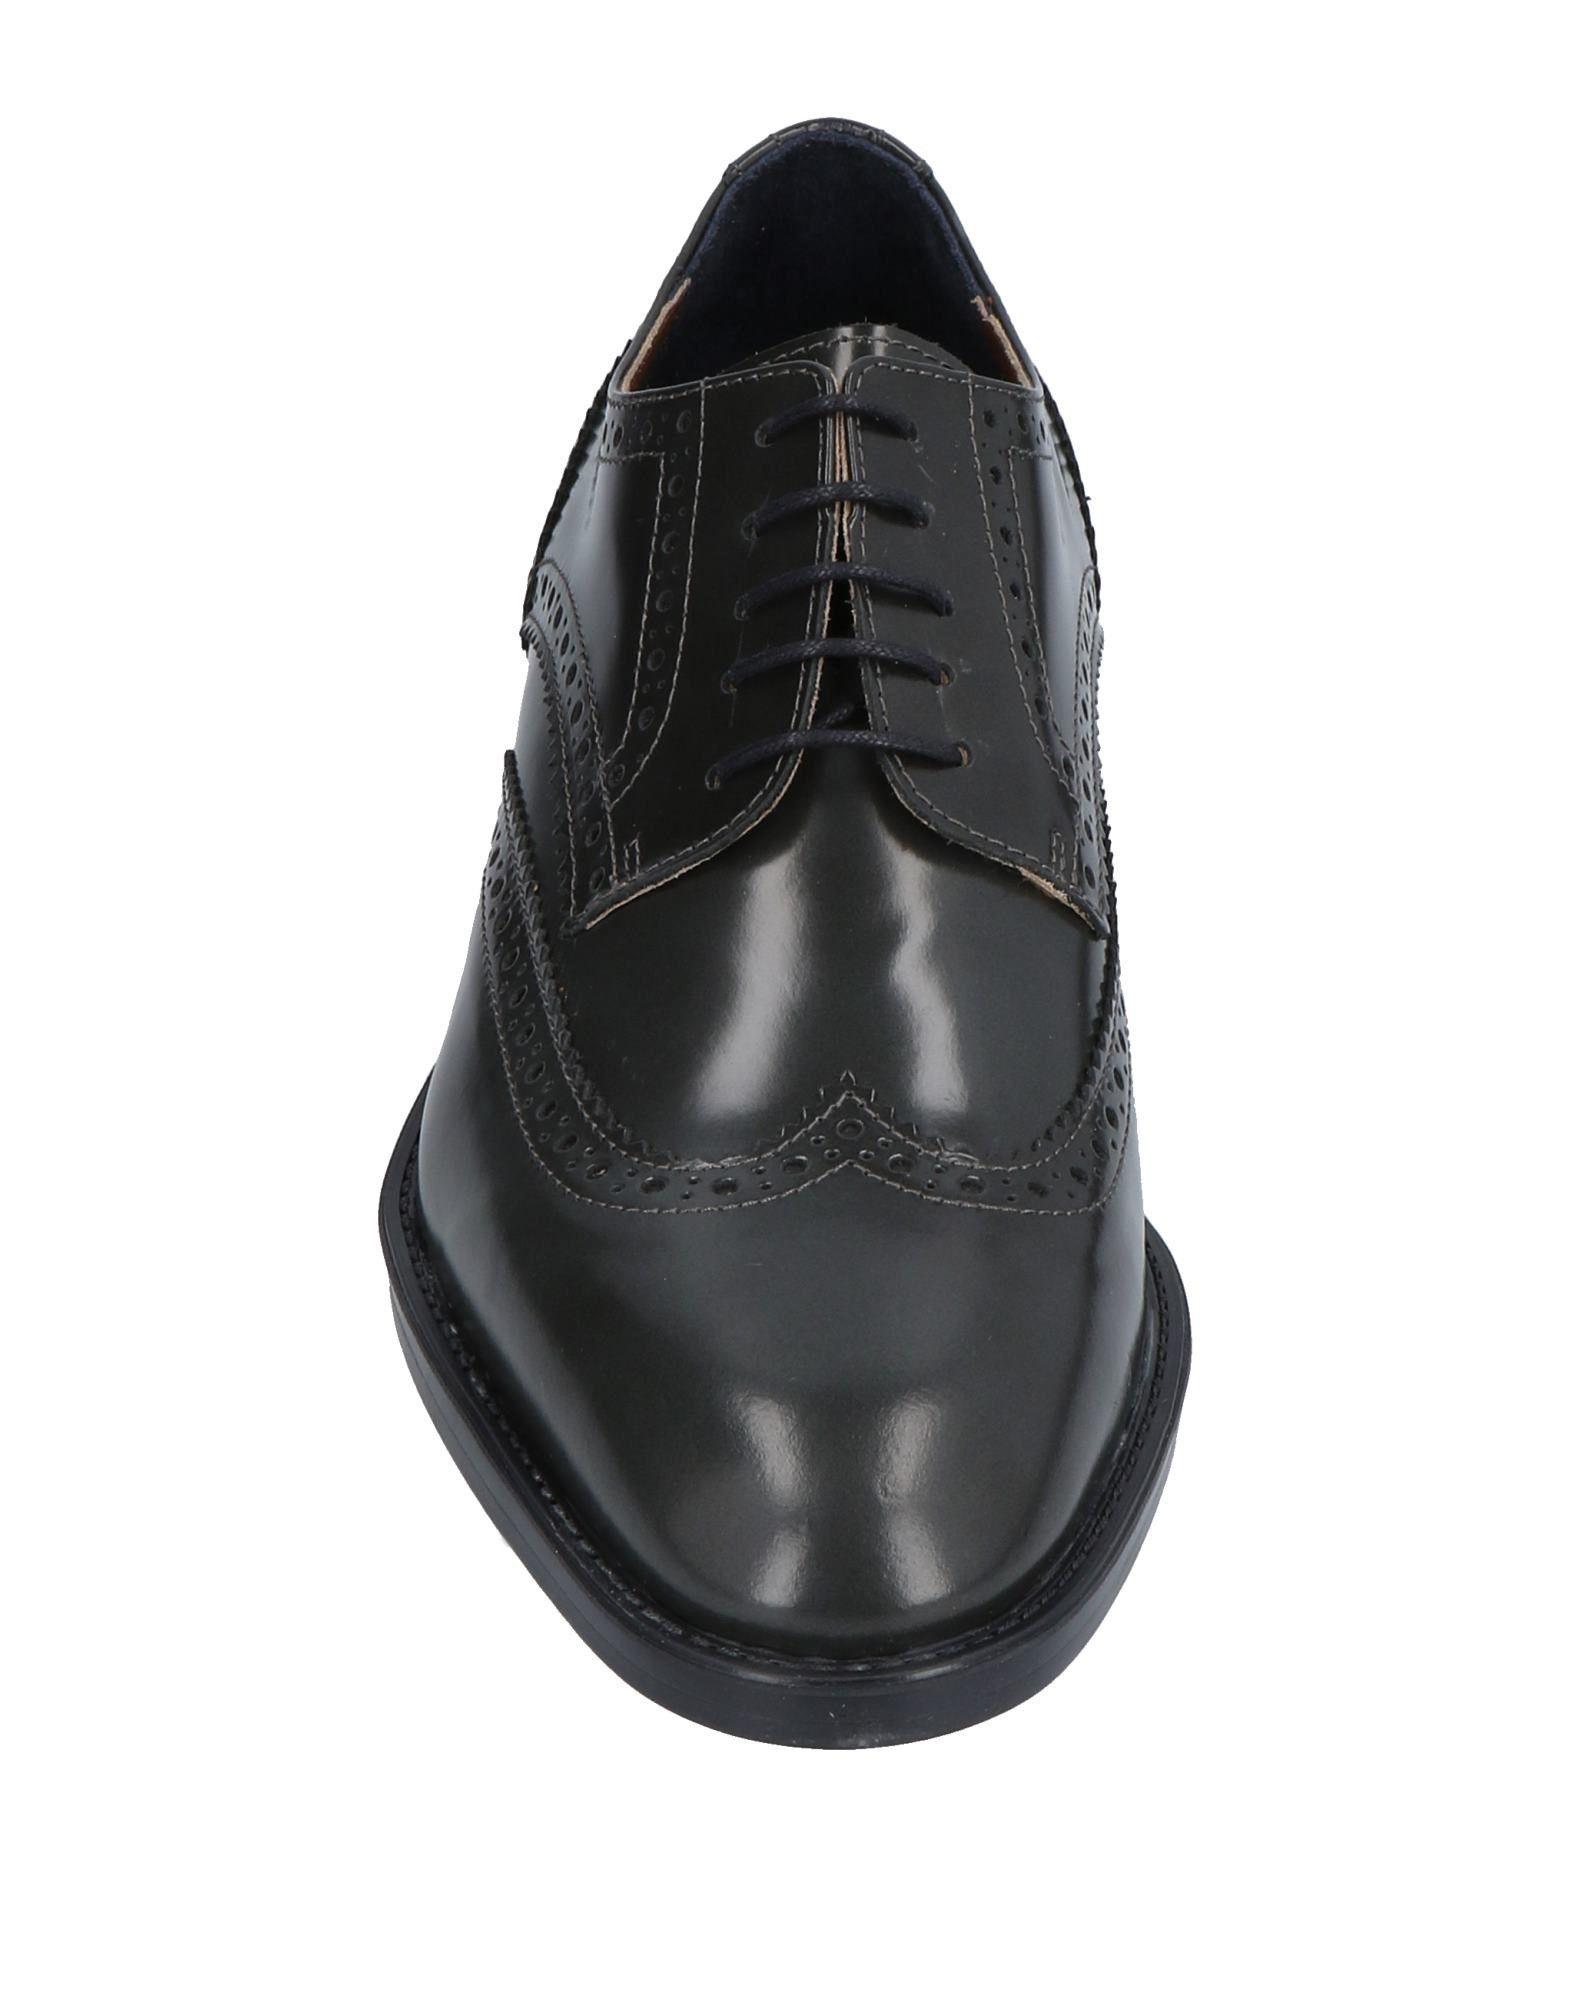 11504073WQ Tsd12 Schnürschuhe Herren  11504073WQ  Heiße Schuhe e5f5bc